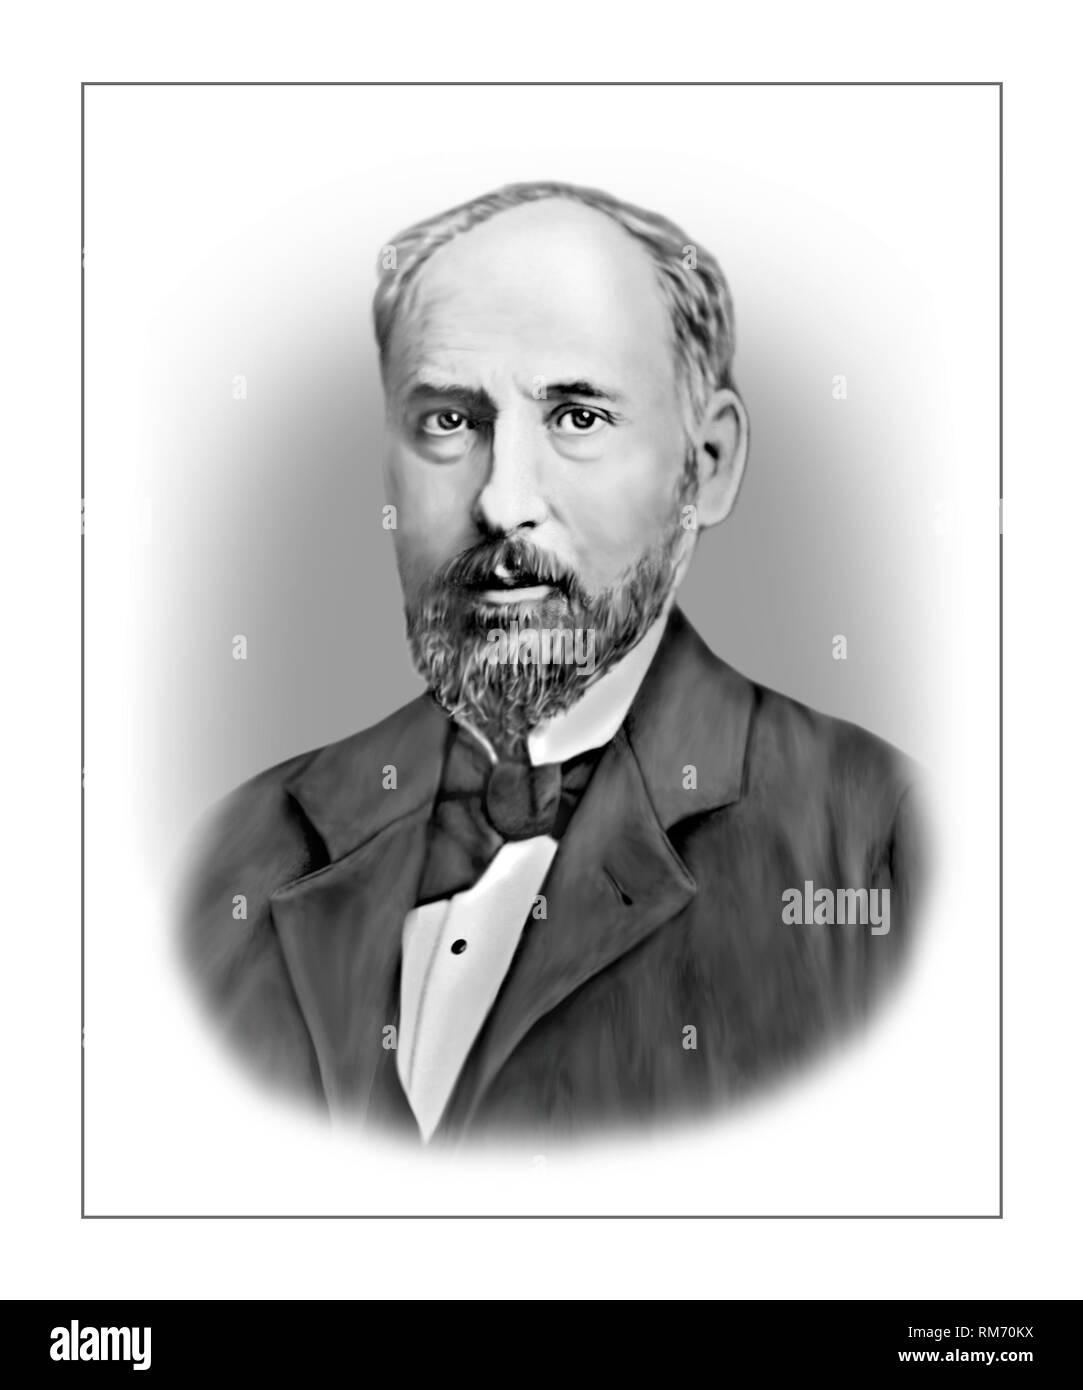 Santiago Ramón y Cajal 1852-1934 pathologiste neuroscientifique Espagnol Photo Stock